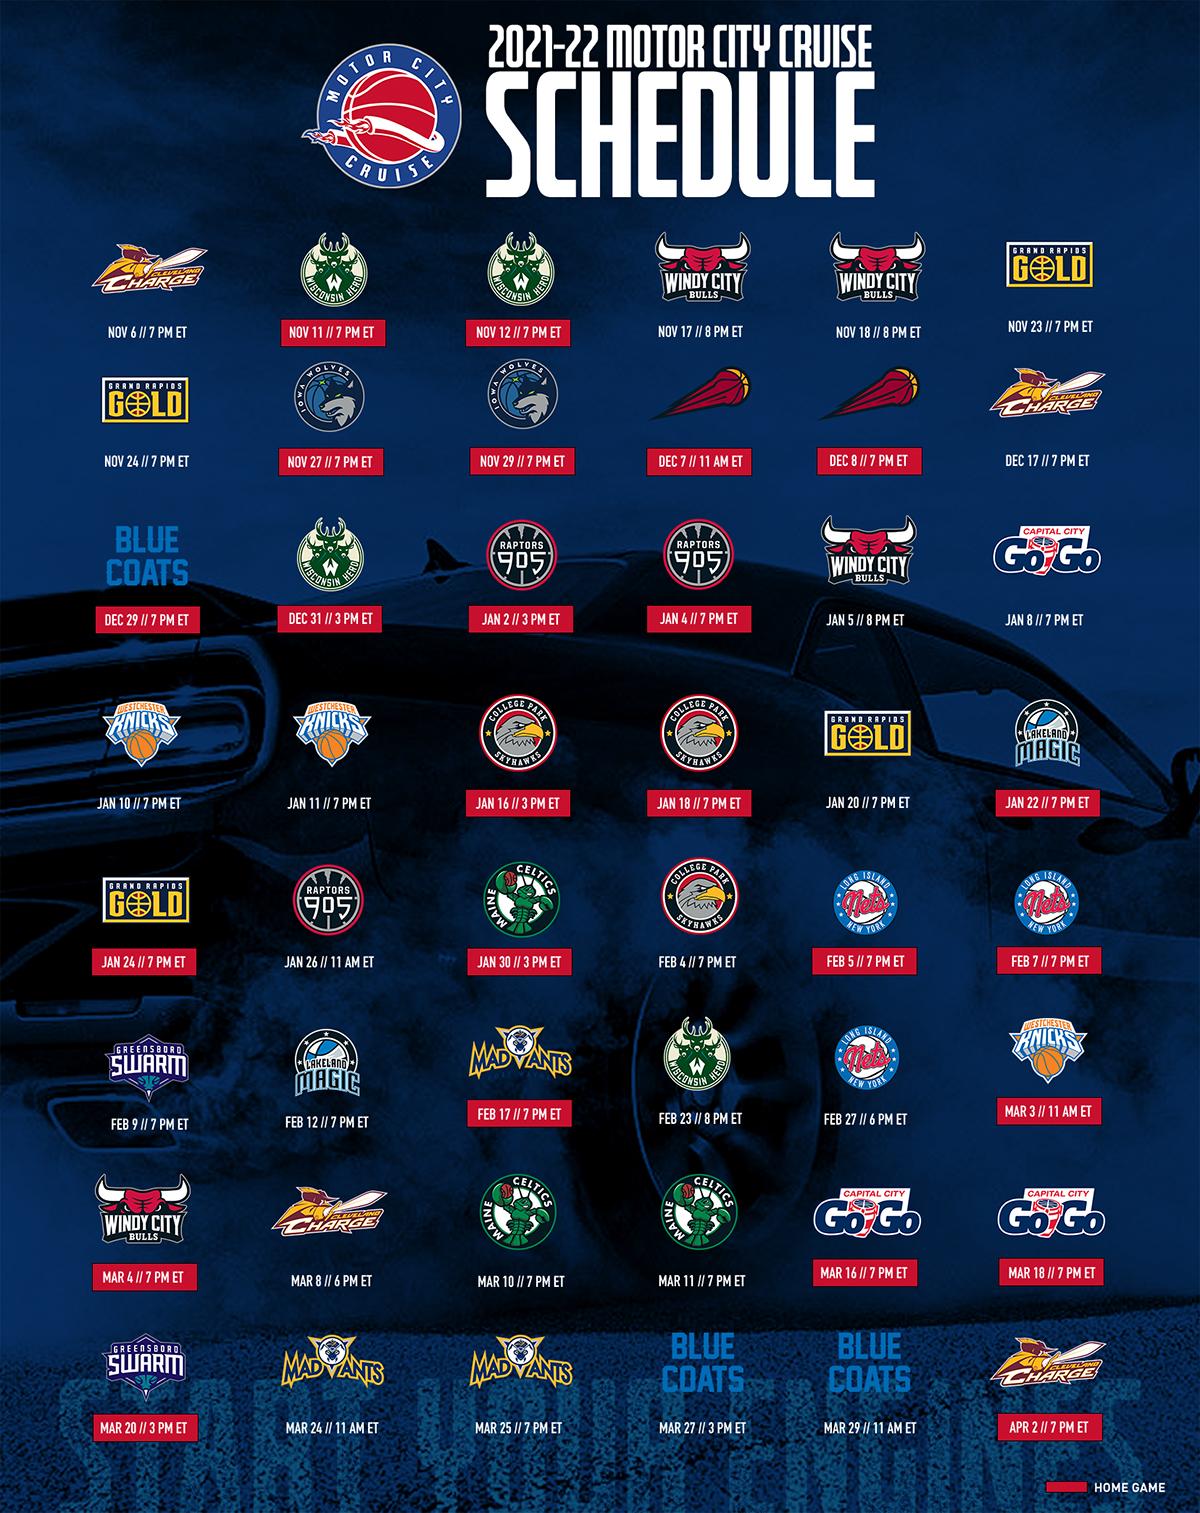 A graphic representing the 21-22 Motor City Cruise Regular Season Schedule